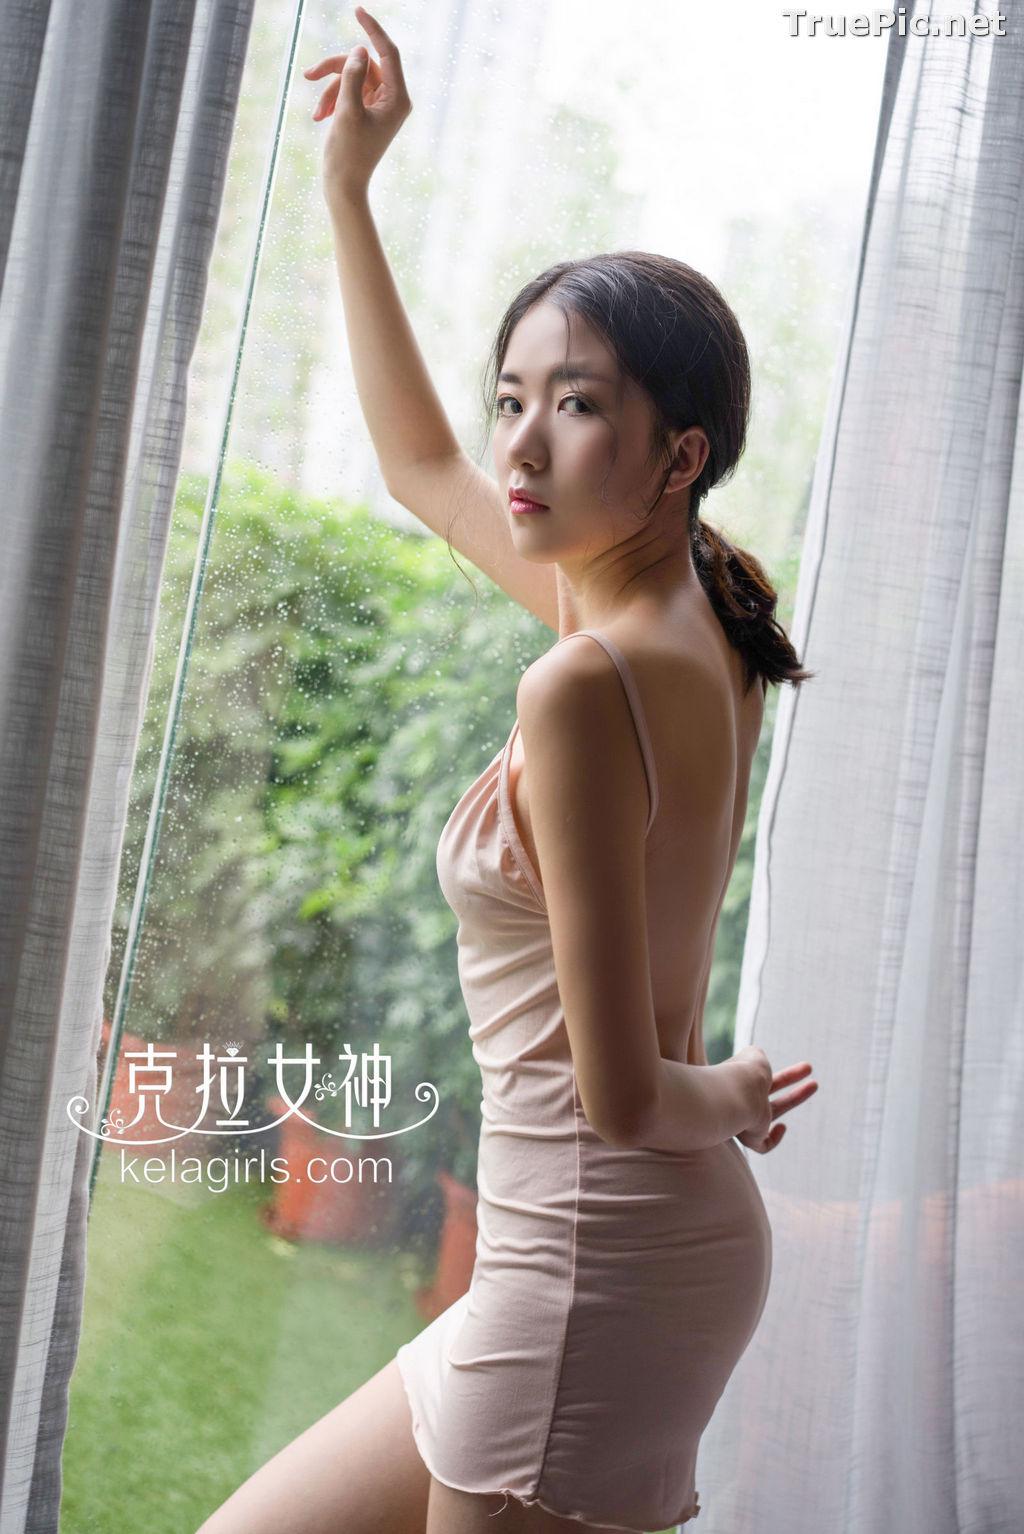 Image KelaGirls 克拉女神 – Chinese Model Ning Ning – Home School Girl Photo Album - TruePic.net - Picture-7